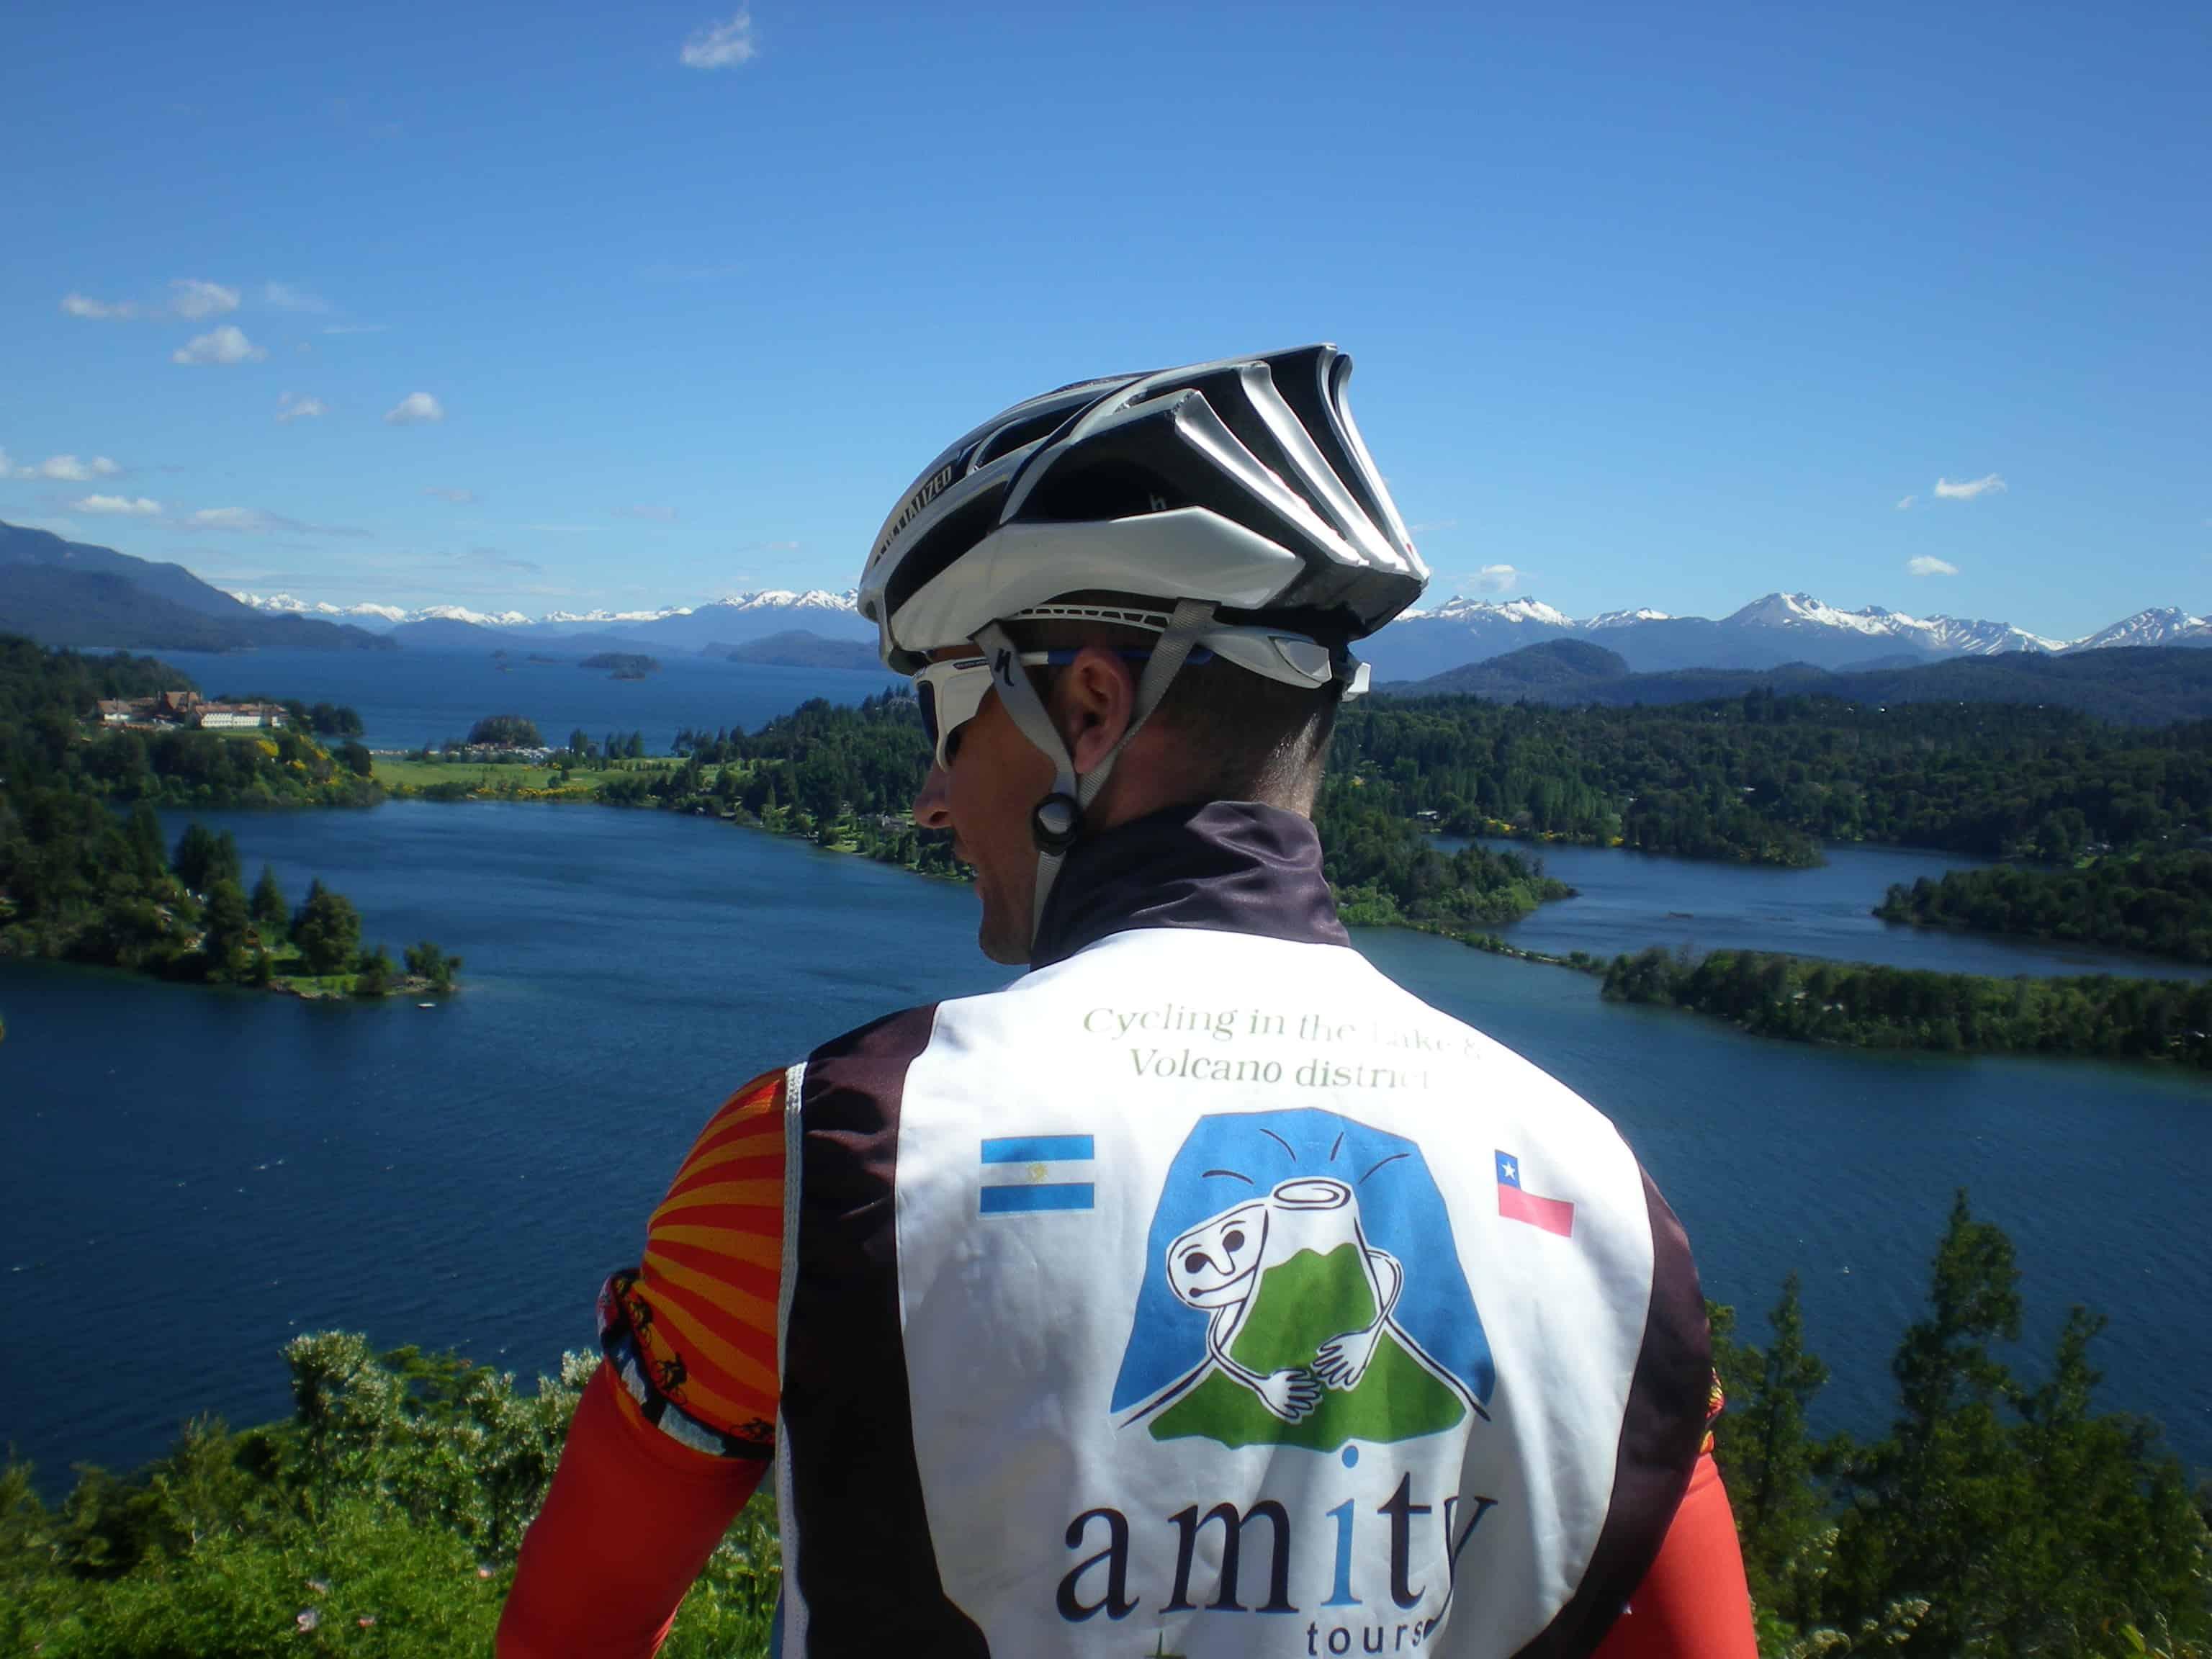 Confirmed Departure Chile Argentina 12 days Bike Tour December 2014